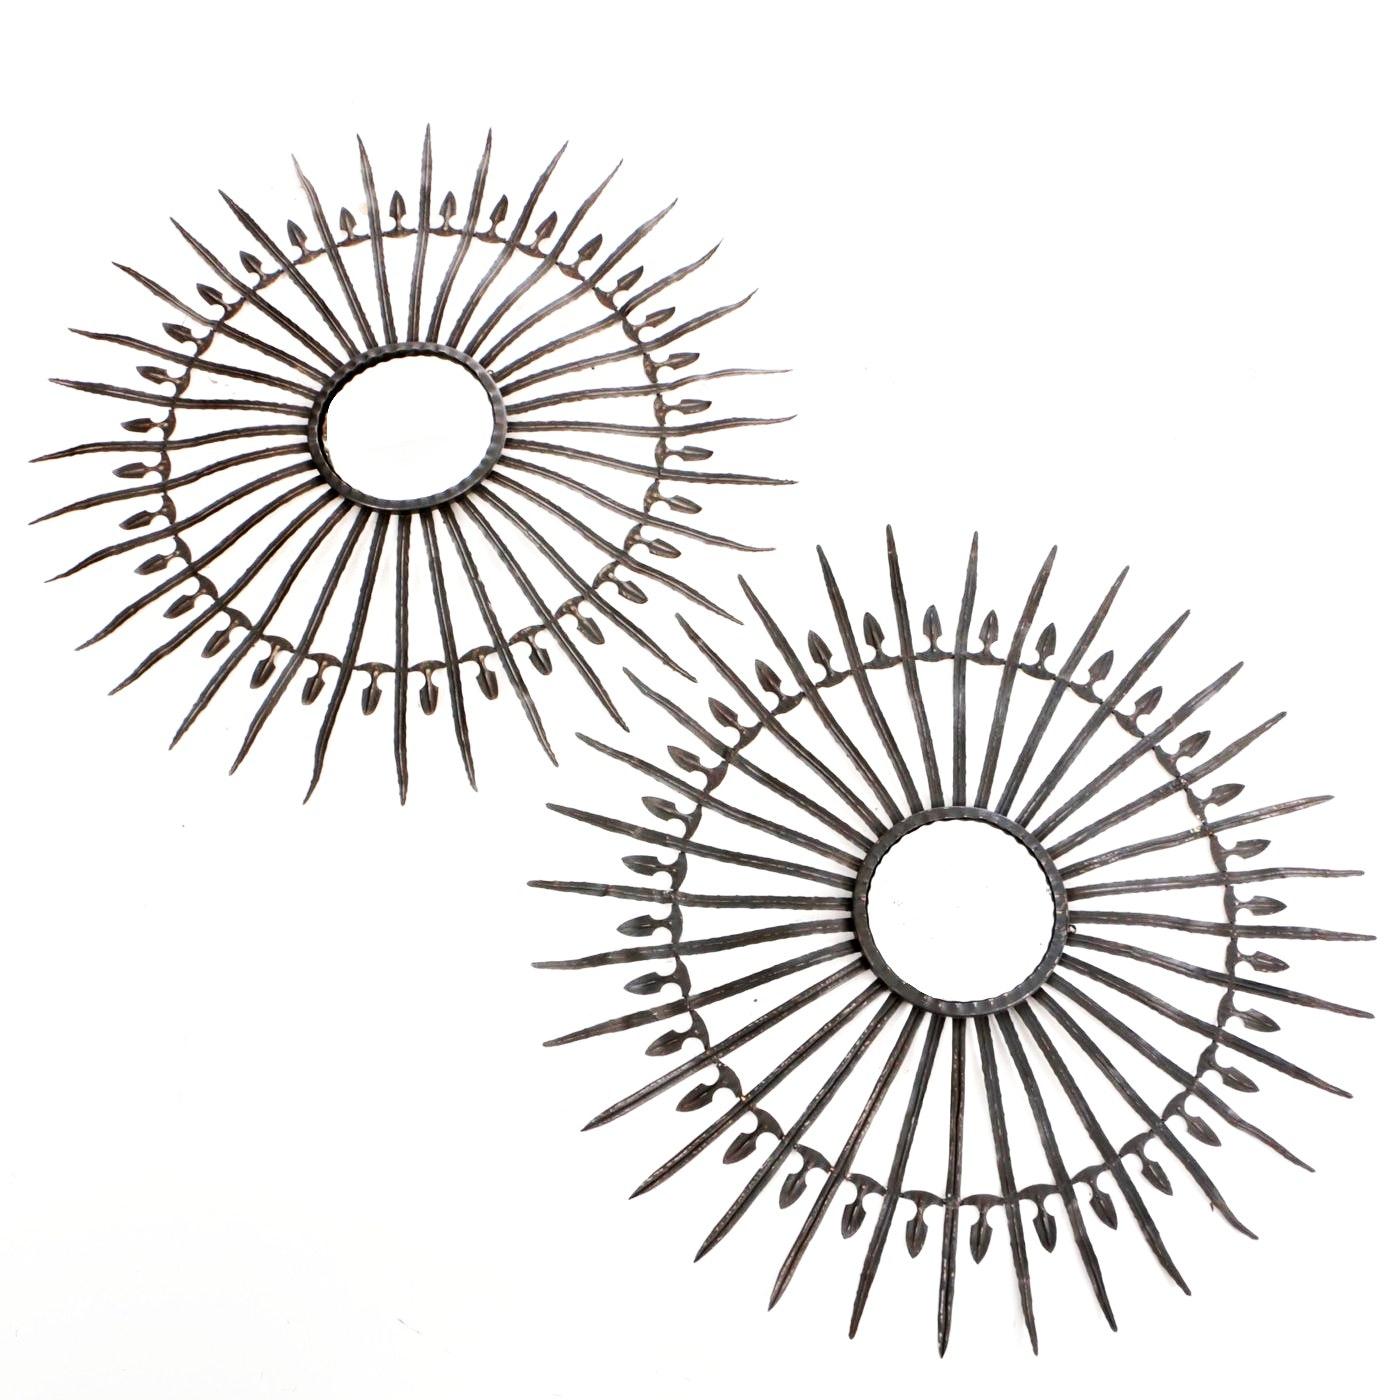 Circa 1950 French Sunburst Mirrors